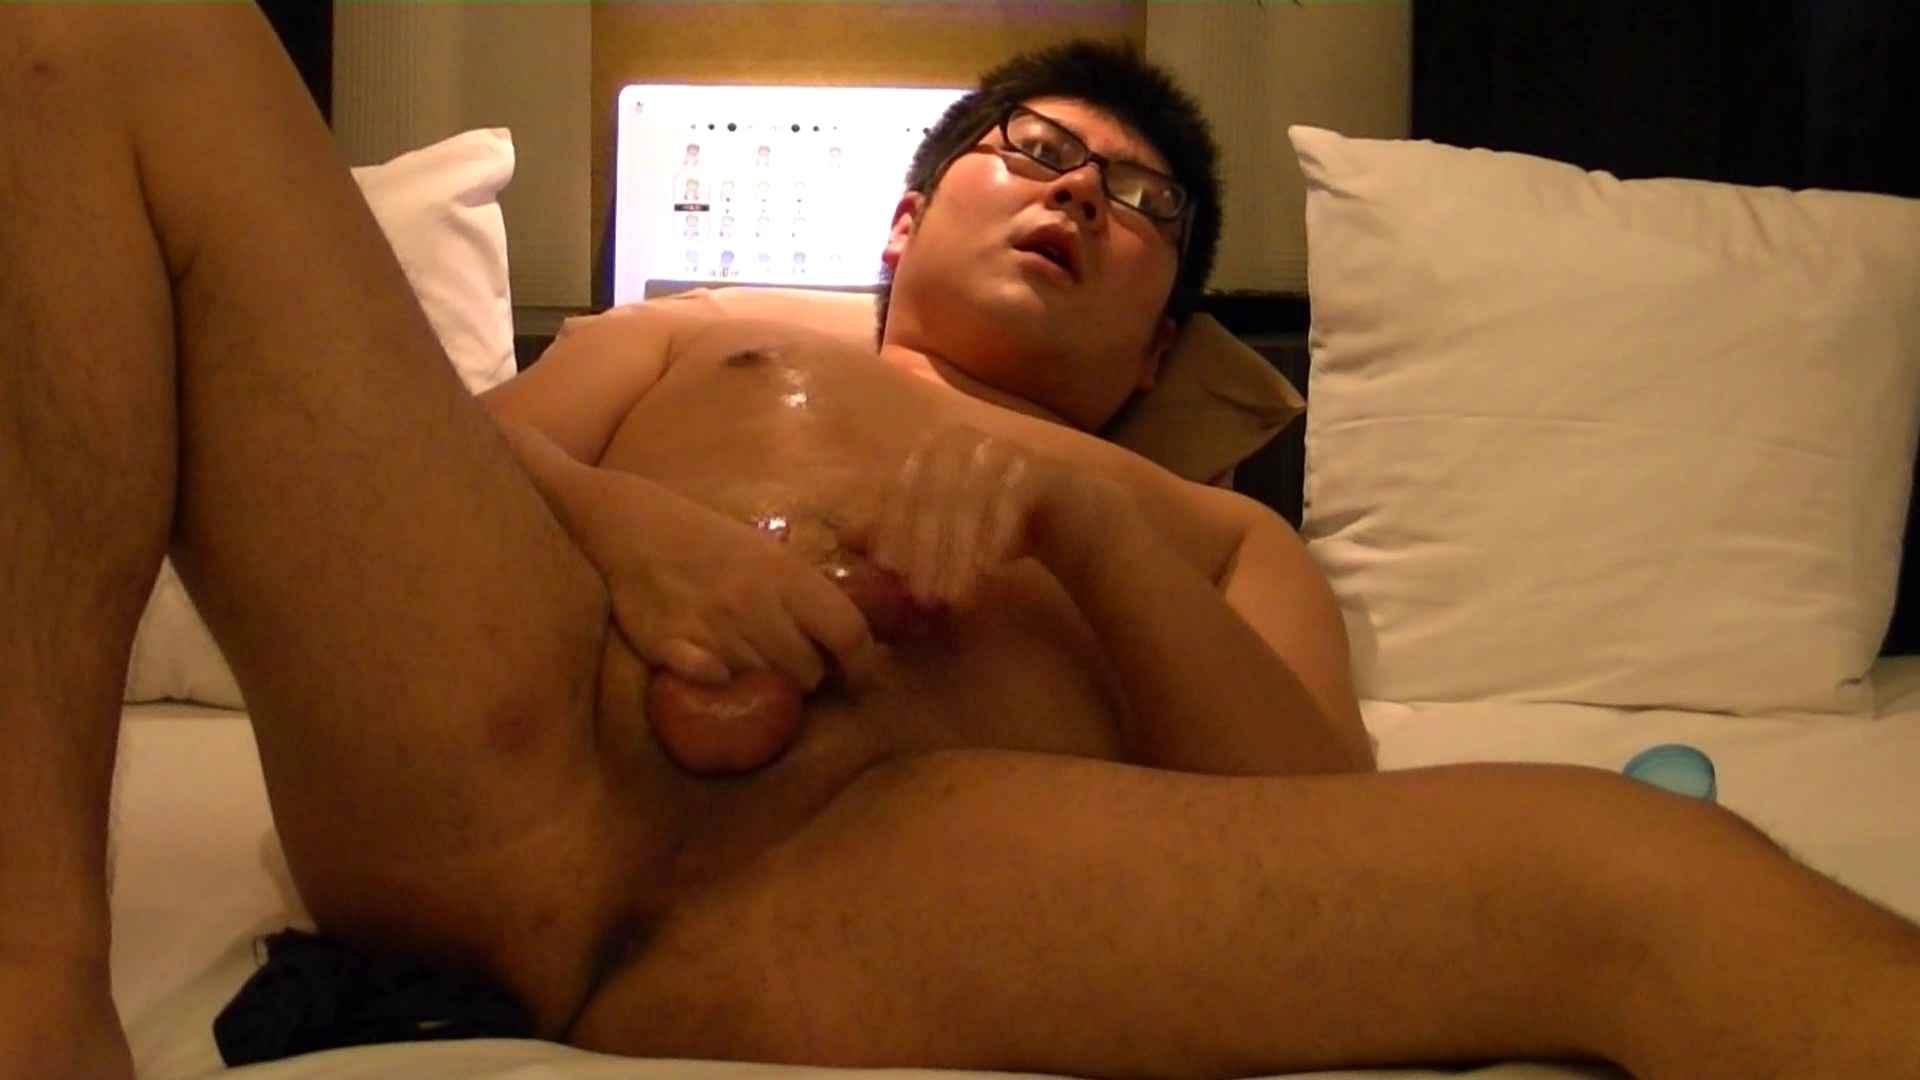 Mr.オナックスさん投稿!HD 貴方のオナニー三万円で撮影させてください。VOL.03 後編 オナニー編 ゲイAV画像 106枚 80